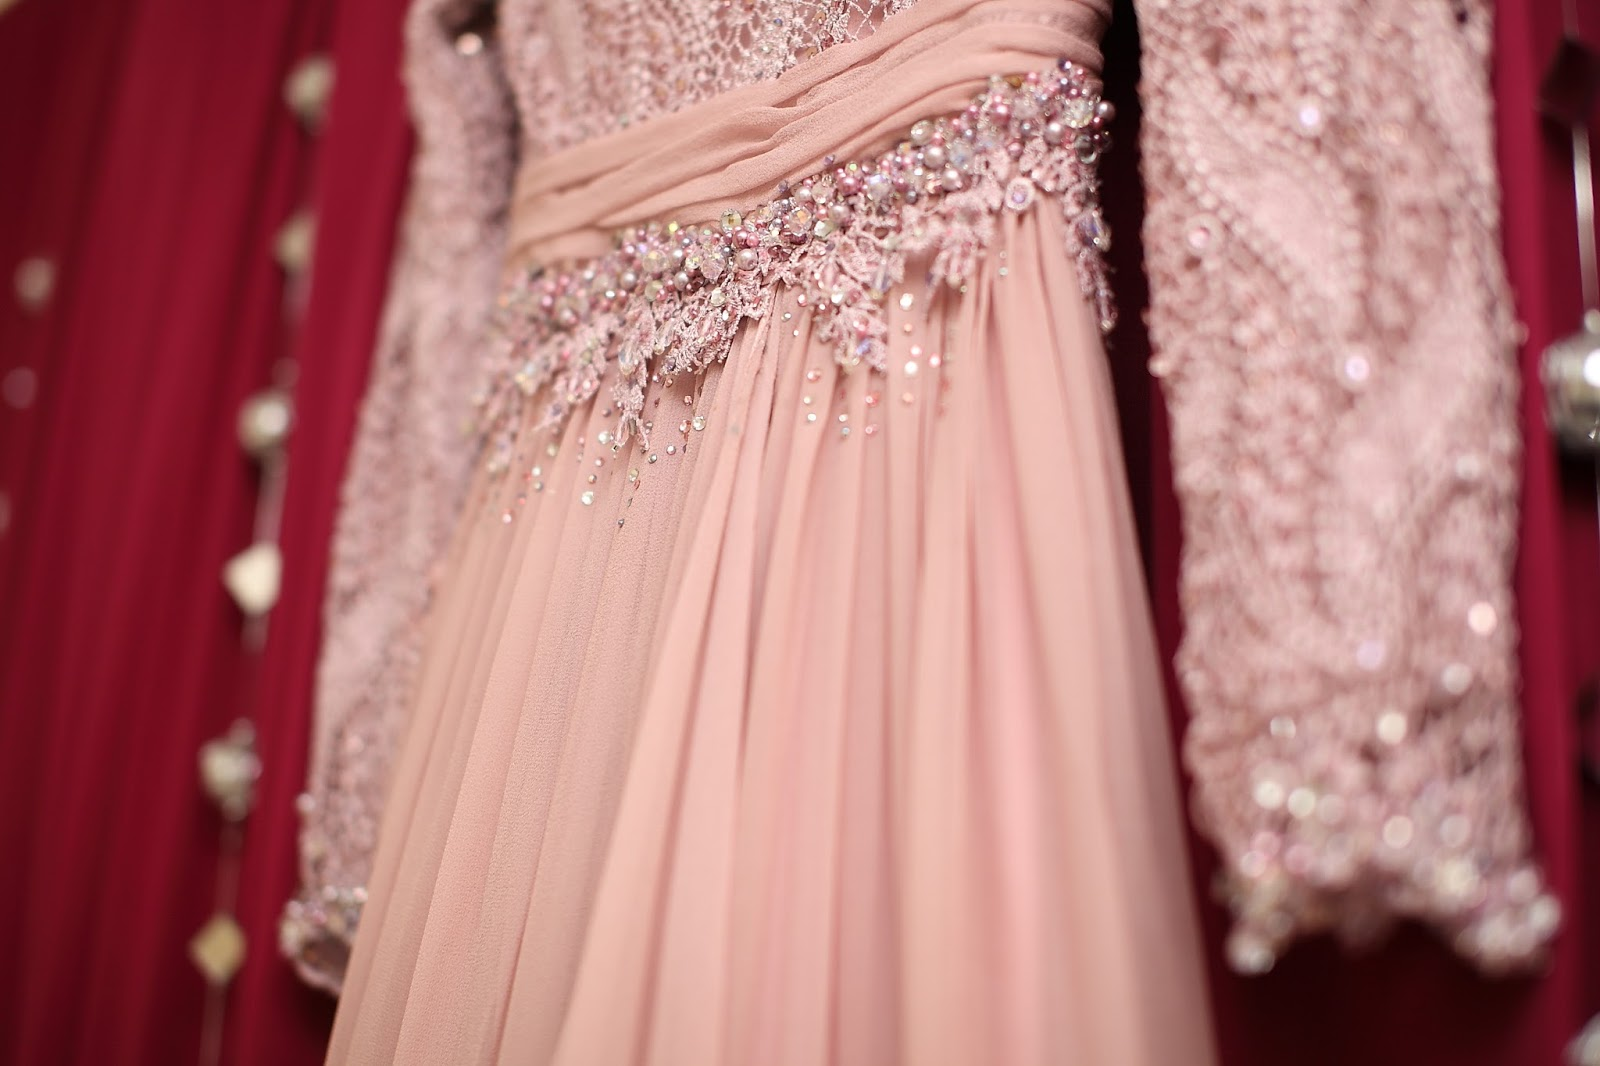 Pelabuhan Mimpi Kita: Wedding Rentals / Sewa Baju Pengantin 11, 11